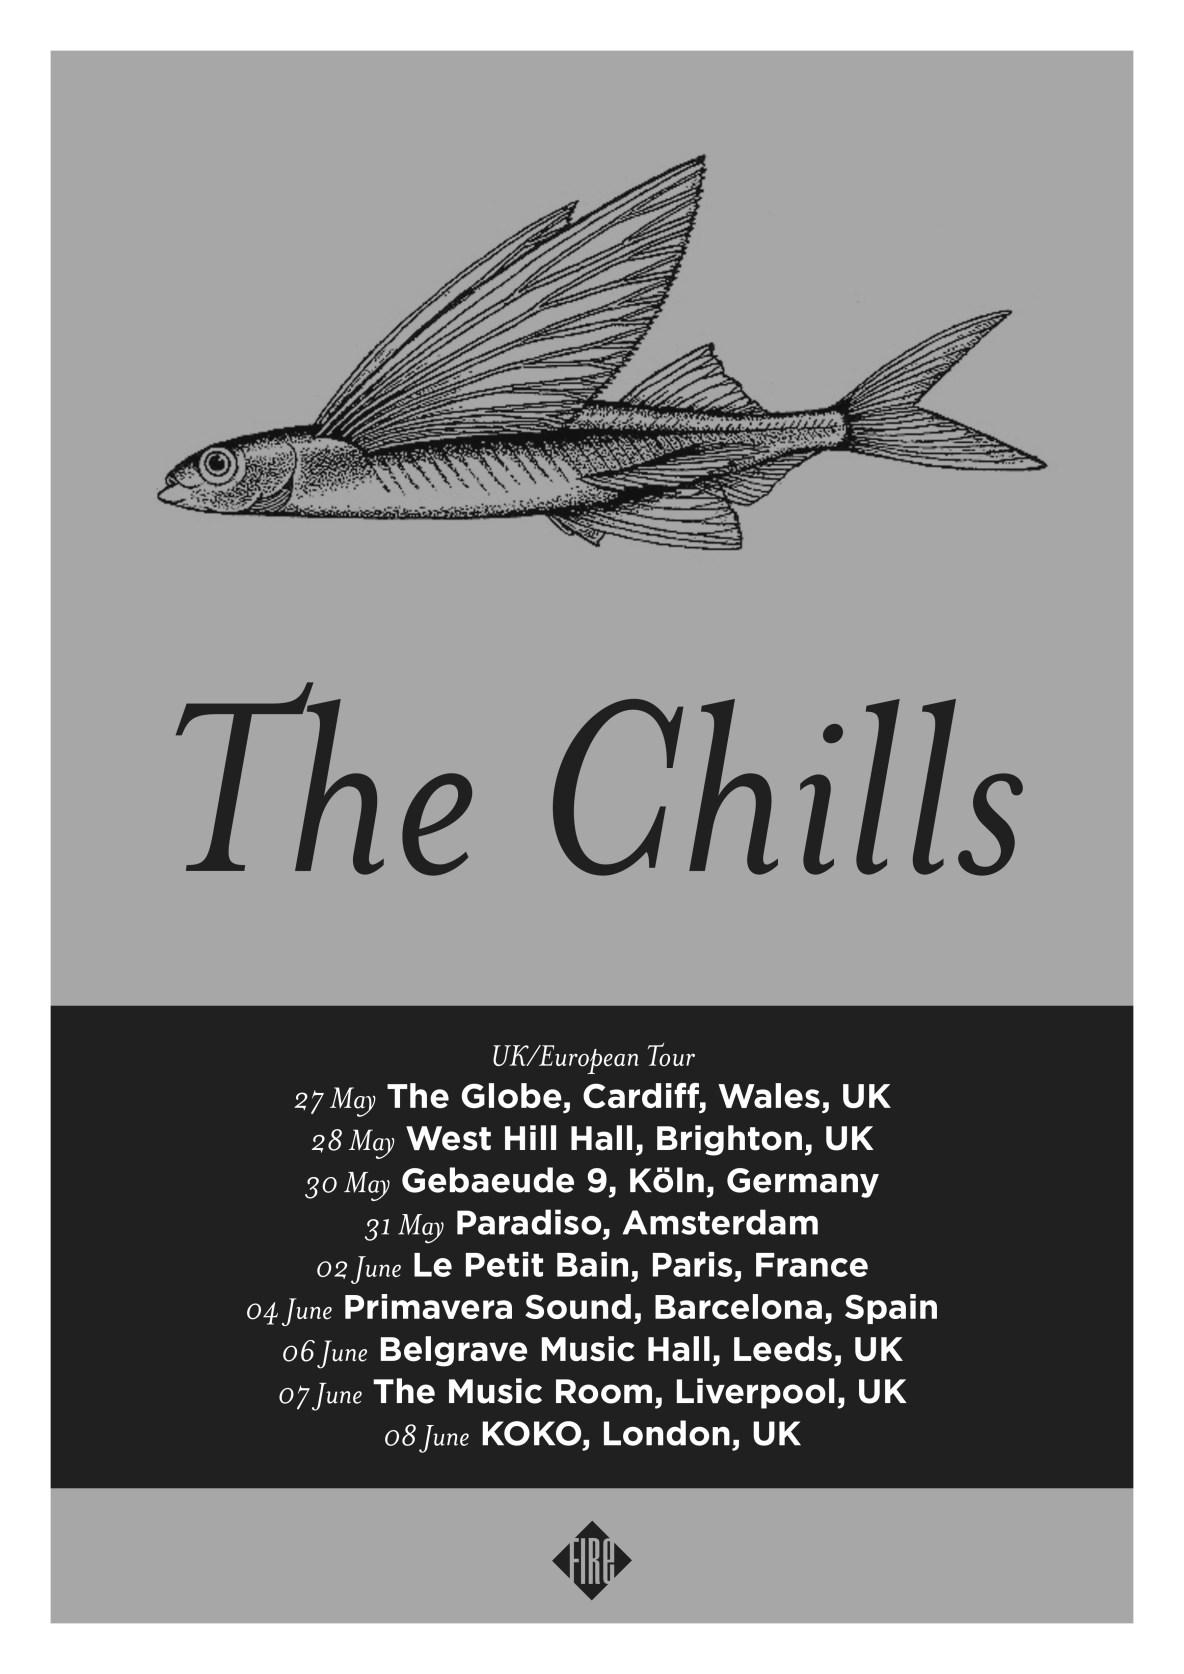 chills ukeu tour poster 2016